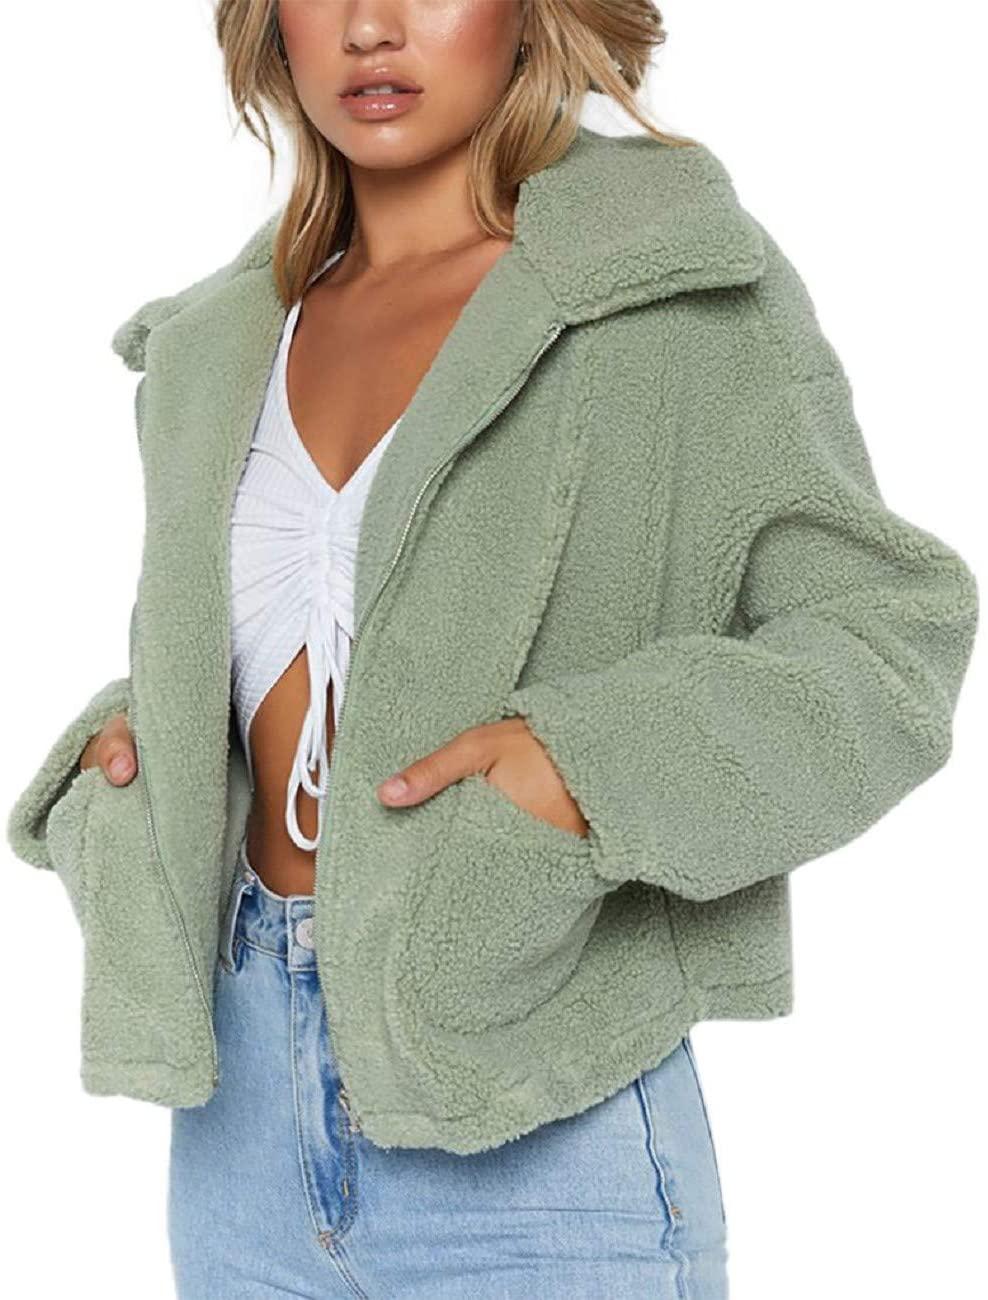 Tsmile Women Zip Up Jacket Fashion Solid Warm Fuzzy Wool Plus Size Long Sleeve Lapel Pocket Loose Fit Sherpa Coat